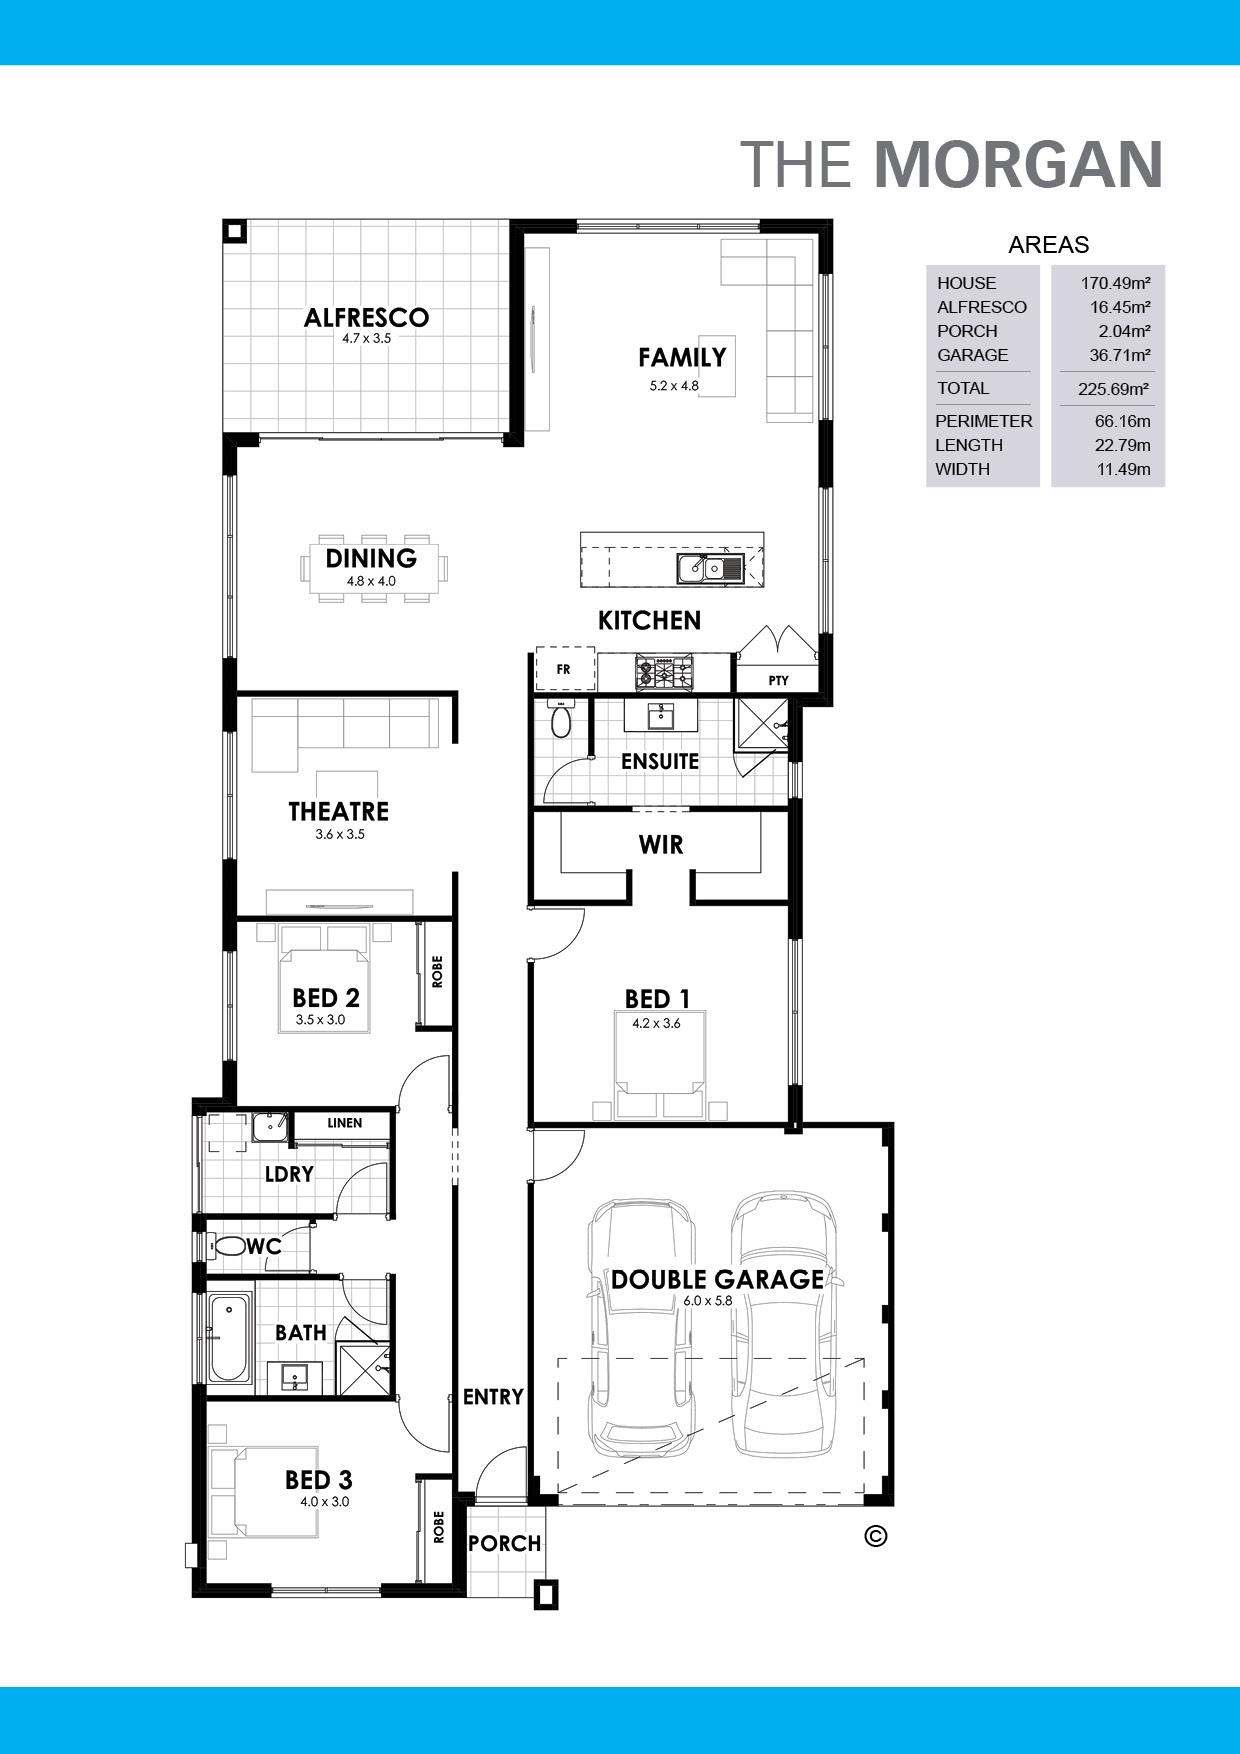 The Morgan Floorplan